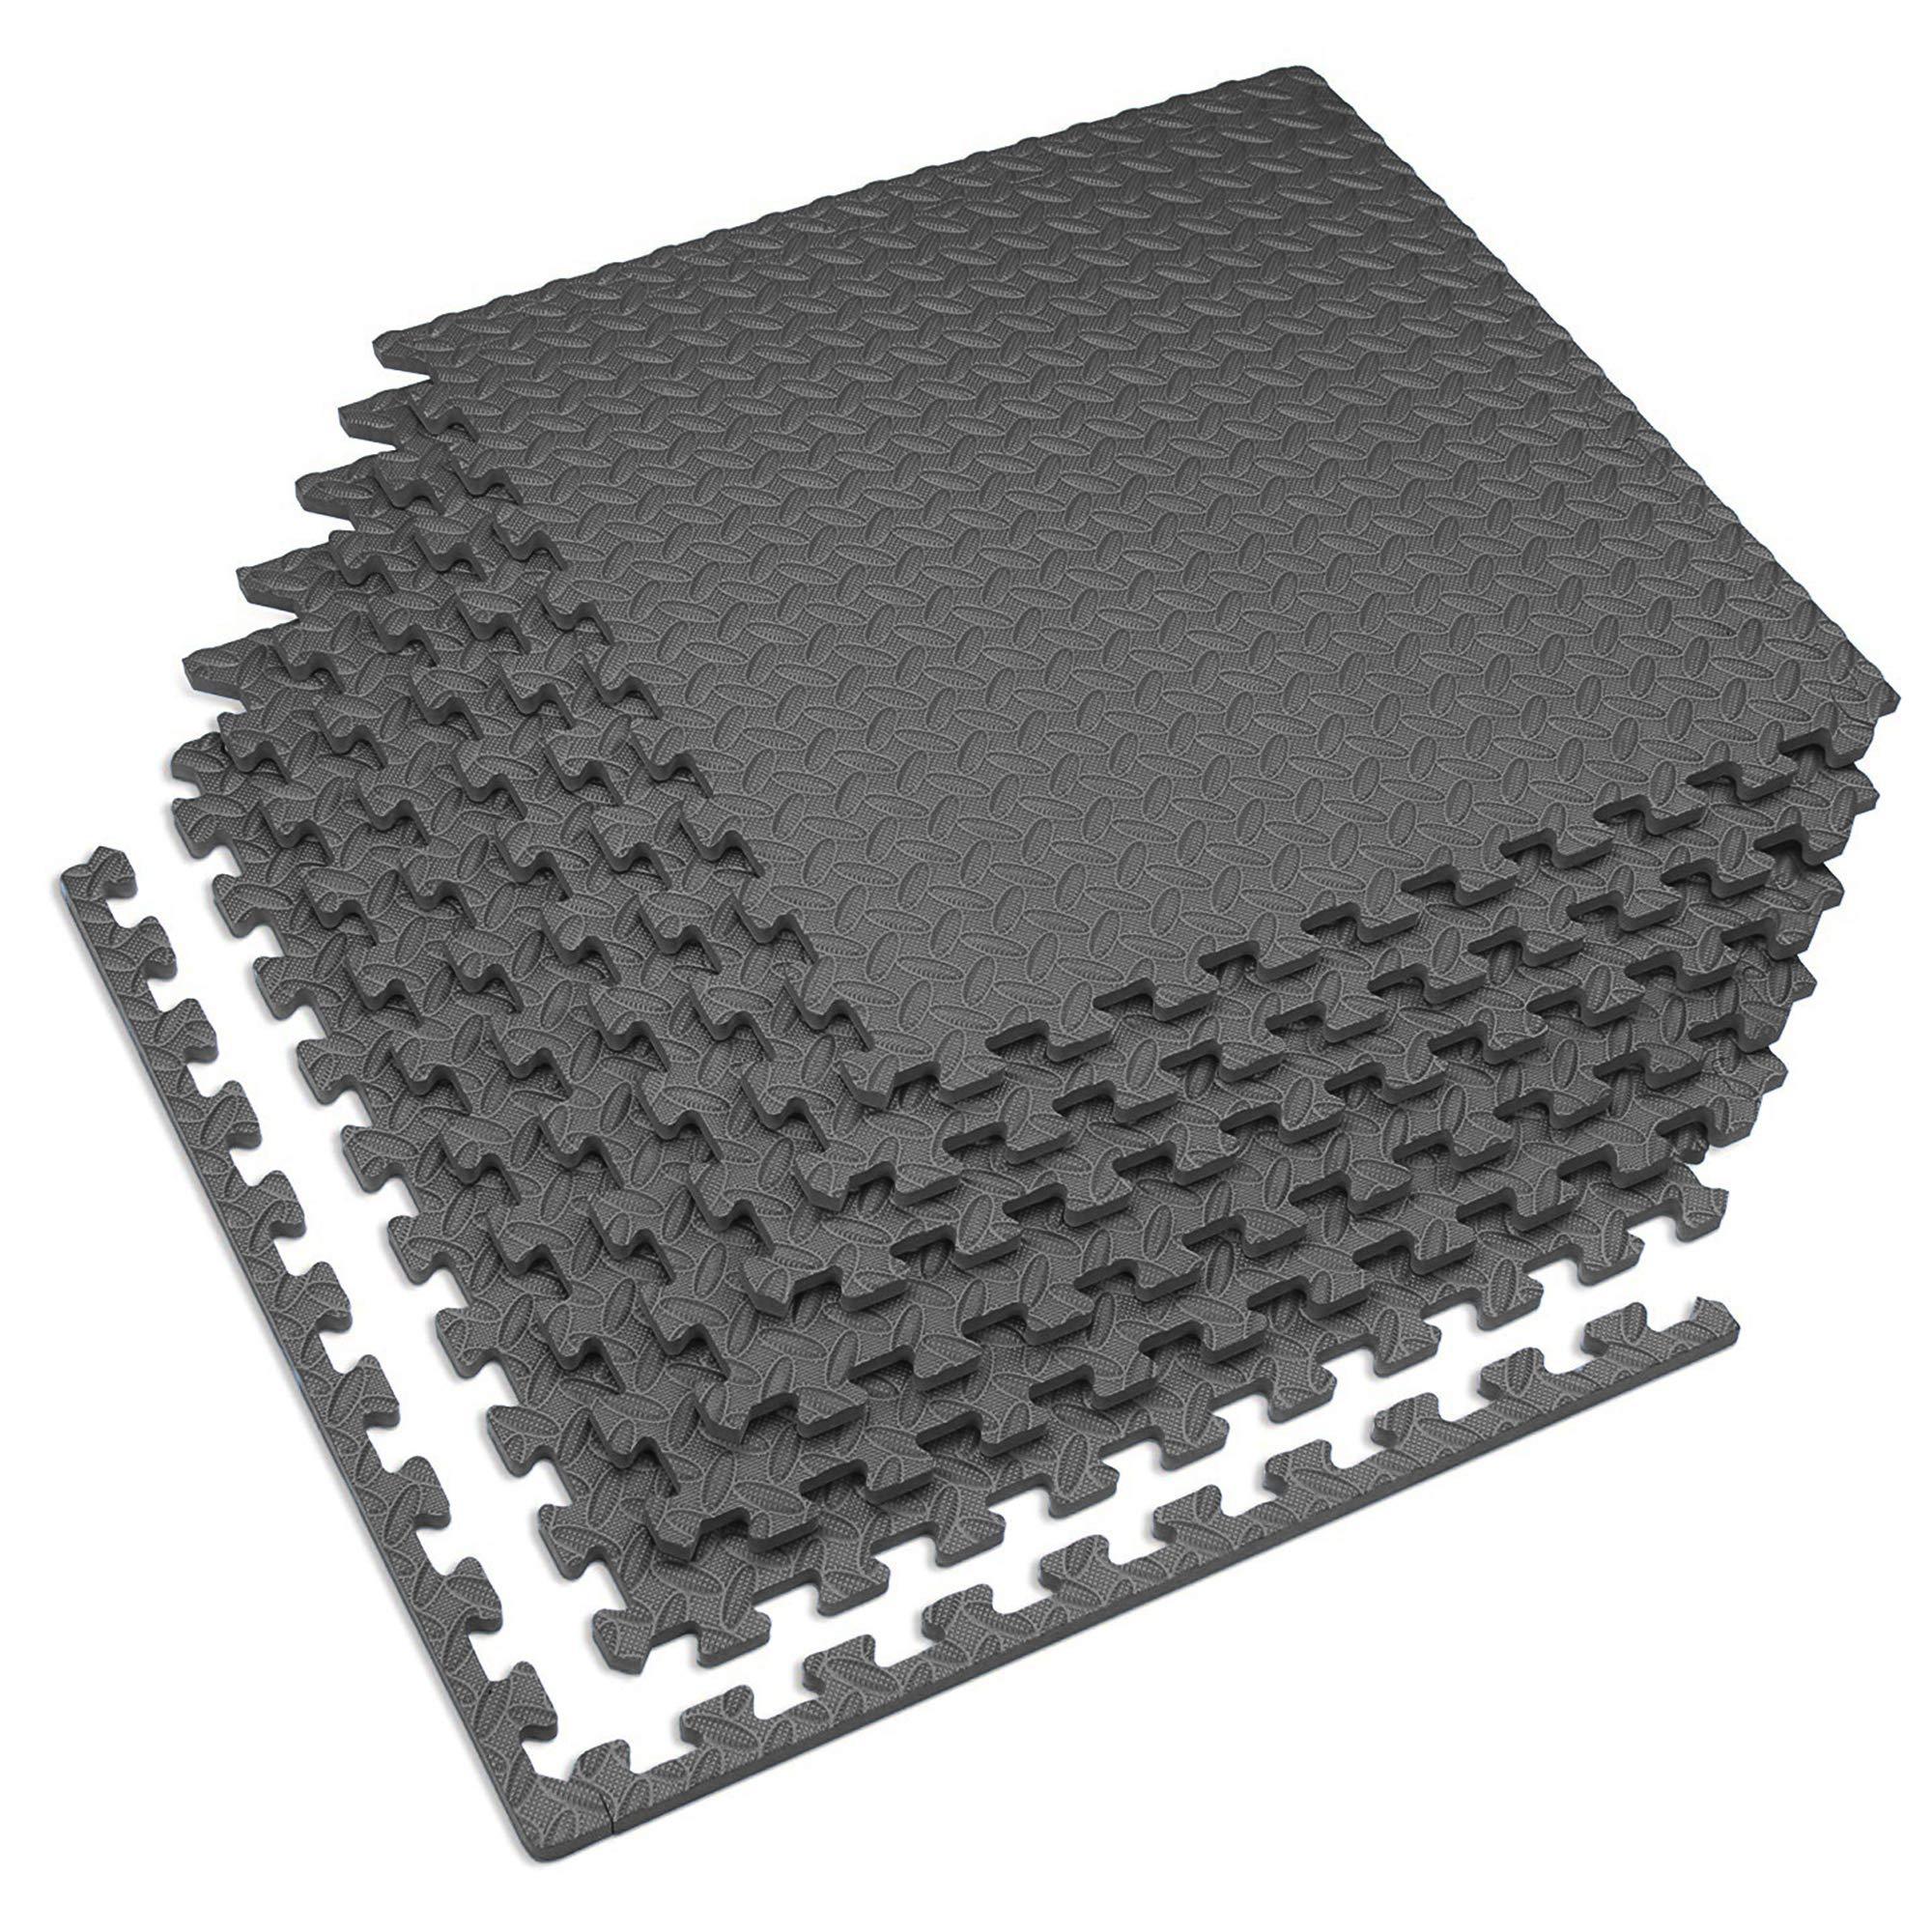 Velotas Charcoal Gray, 24 sq' (6 Tiles) Charcoal Gray 1/2'' Thick Interlocking Foam Fitness Mat